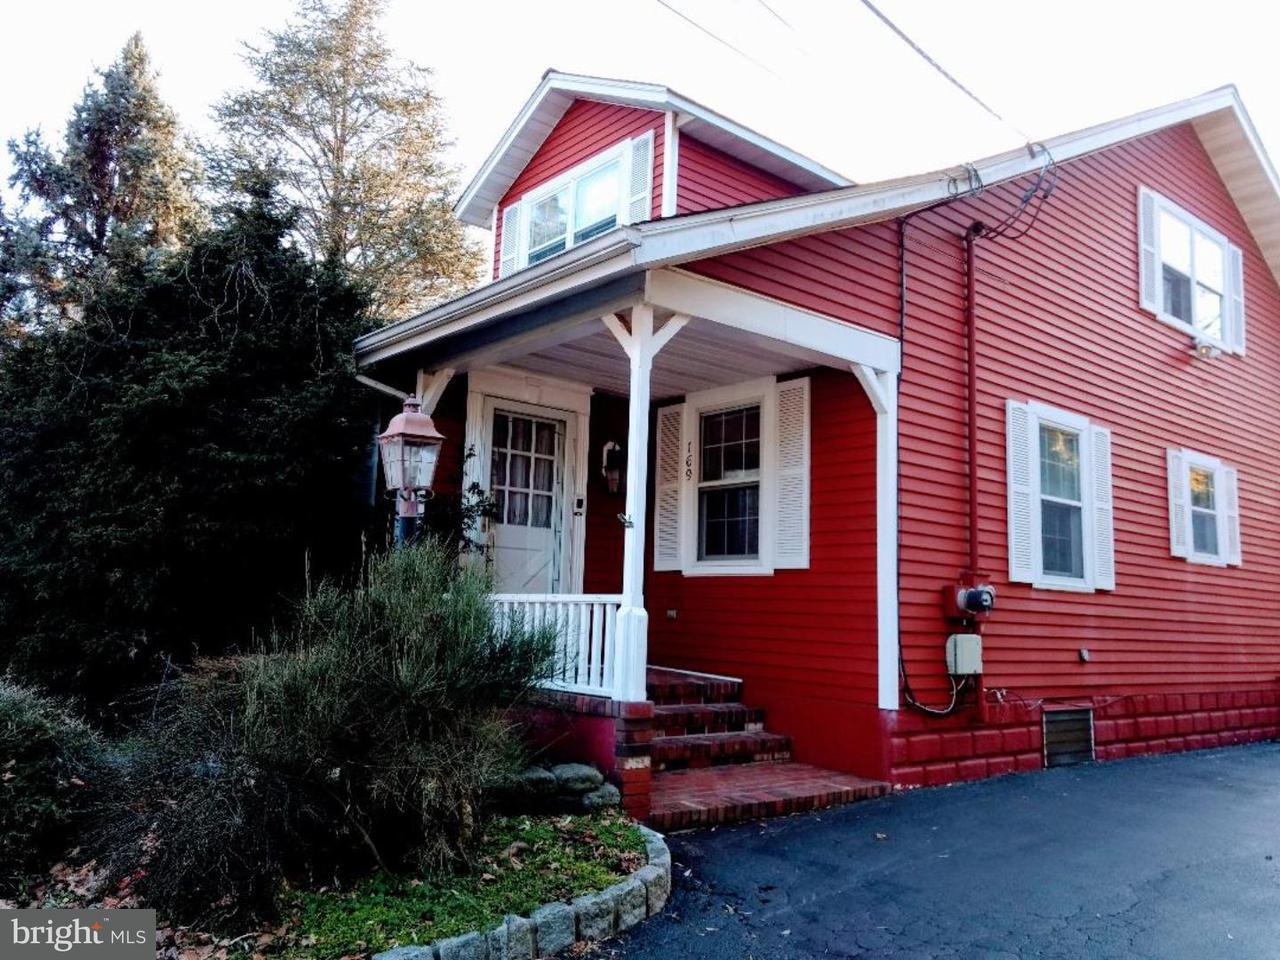 独户住宅 为 销售 在 169 OLD CRANBURY Road East Windsor Township, 新泽西州 08512 美国在/周边: East Windsor Township